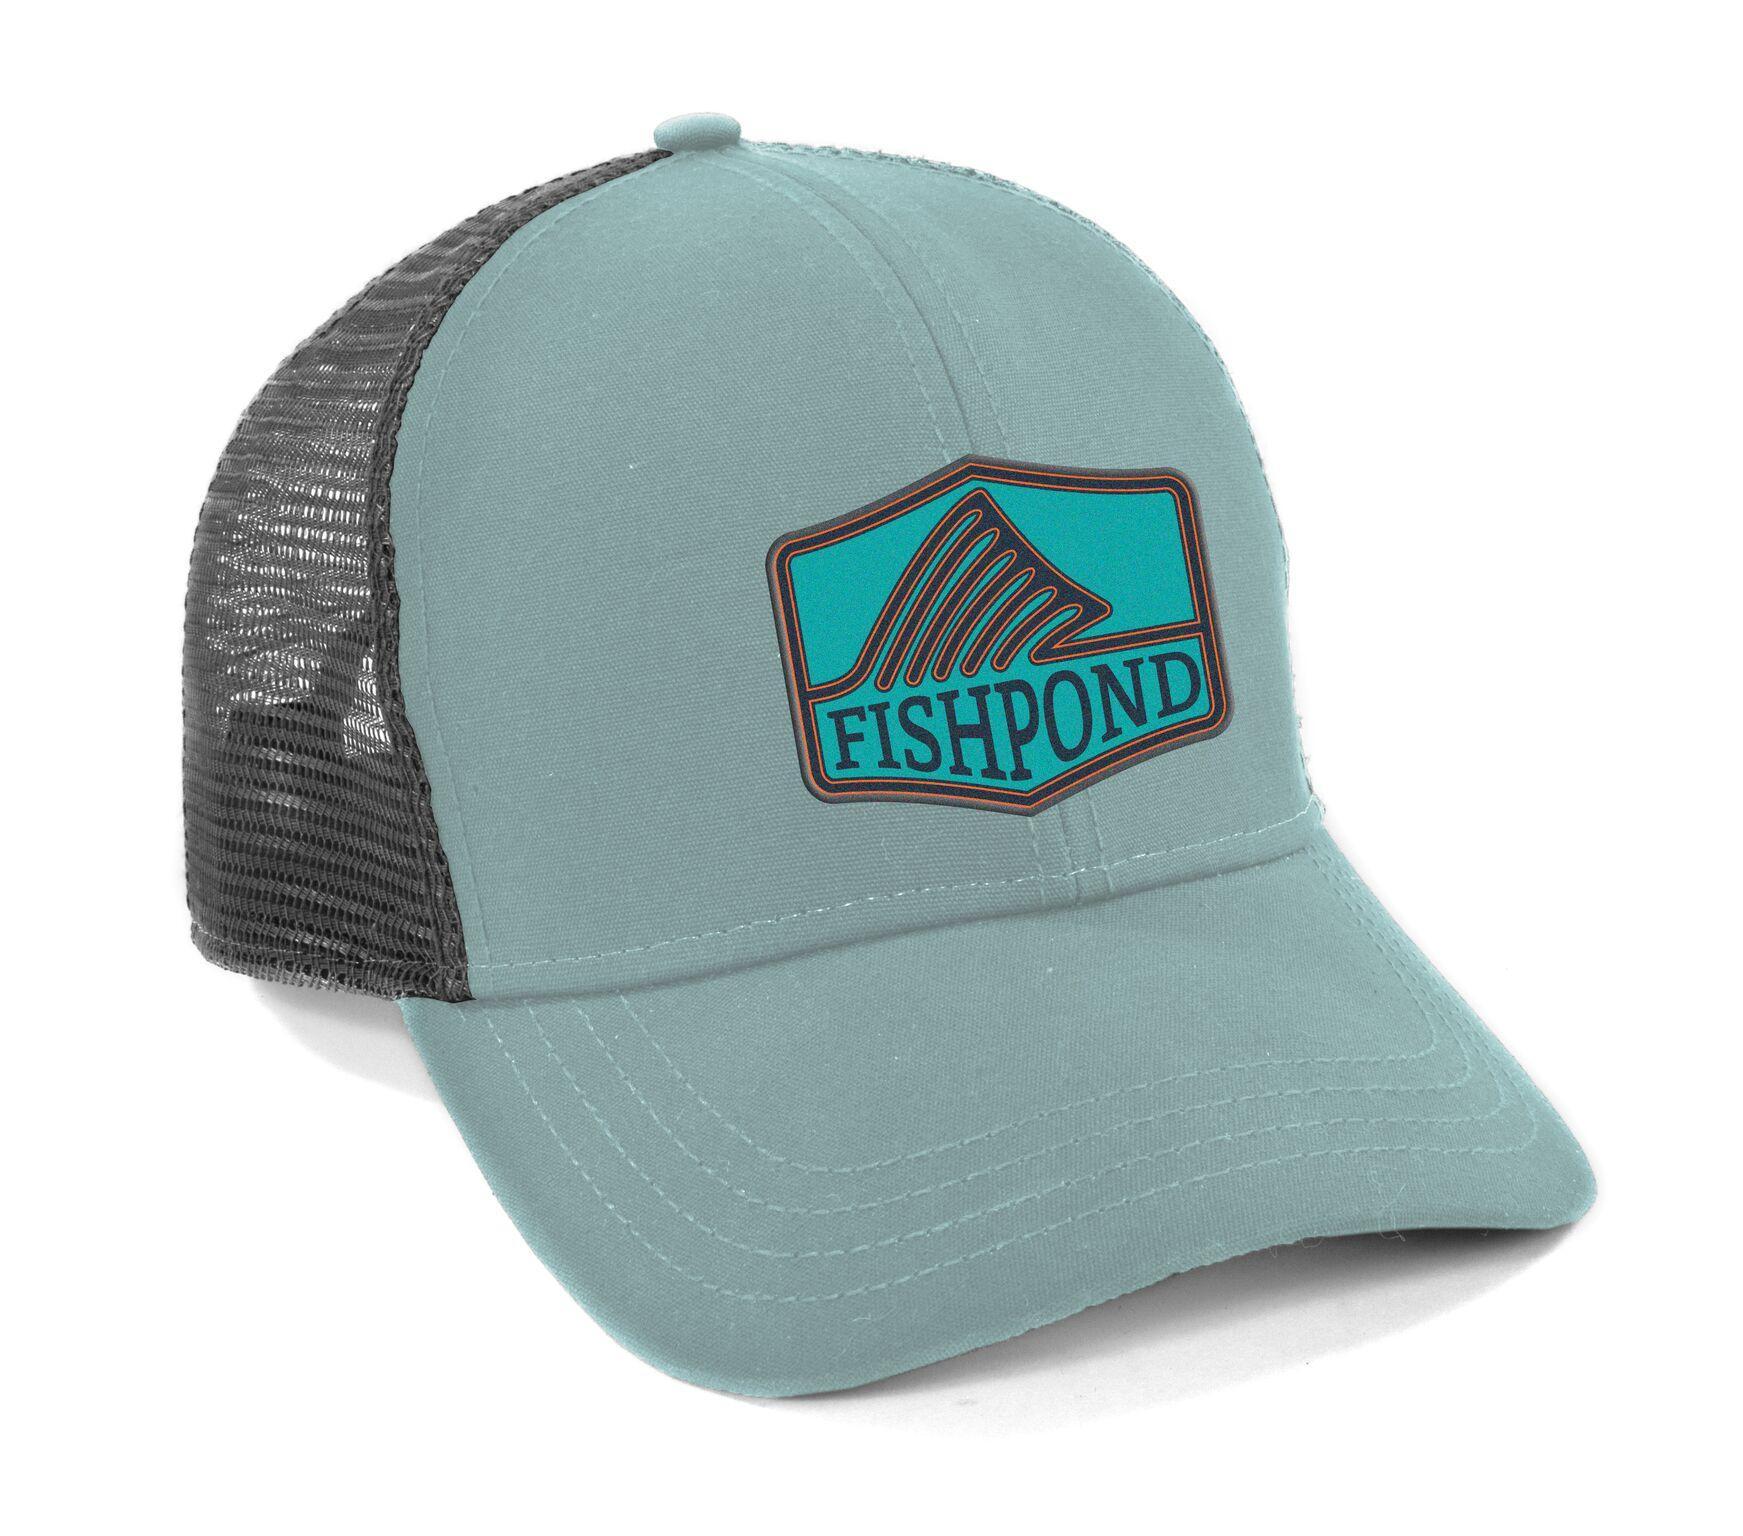 7afae4ccabd79 Fishpond Dorsal Fin Hat